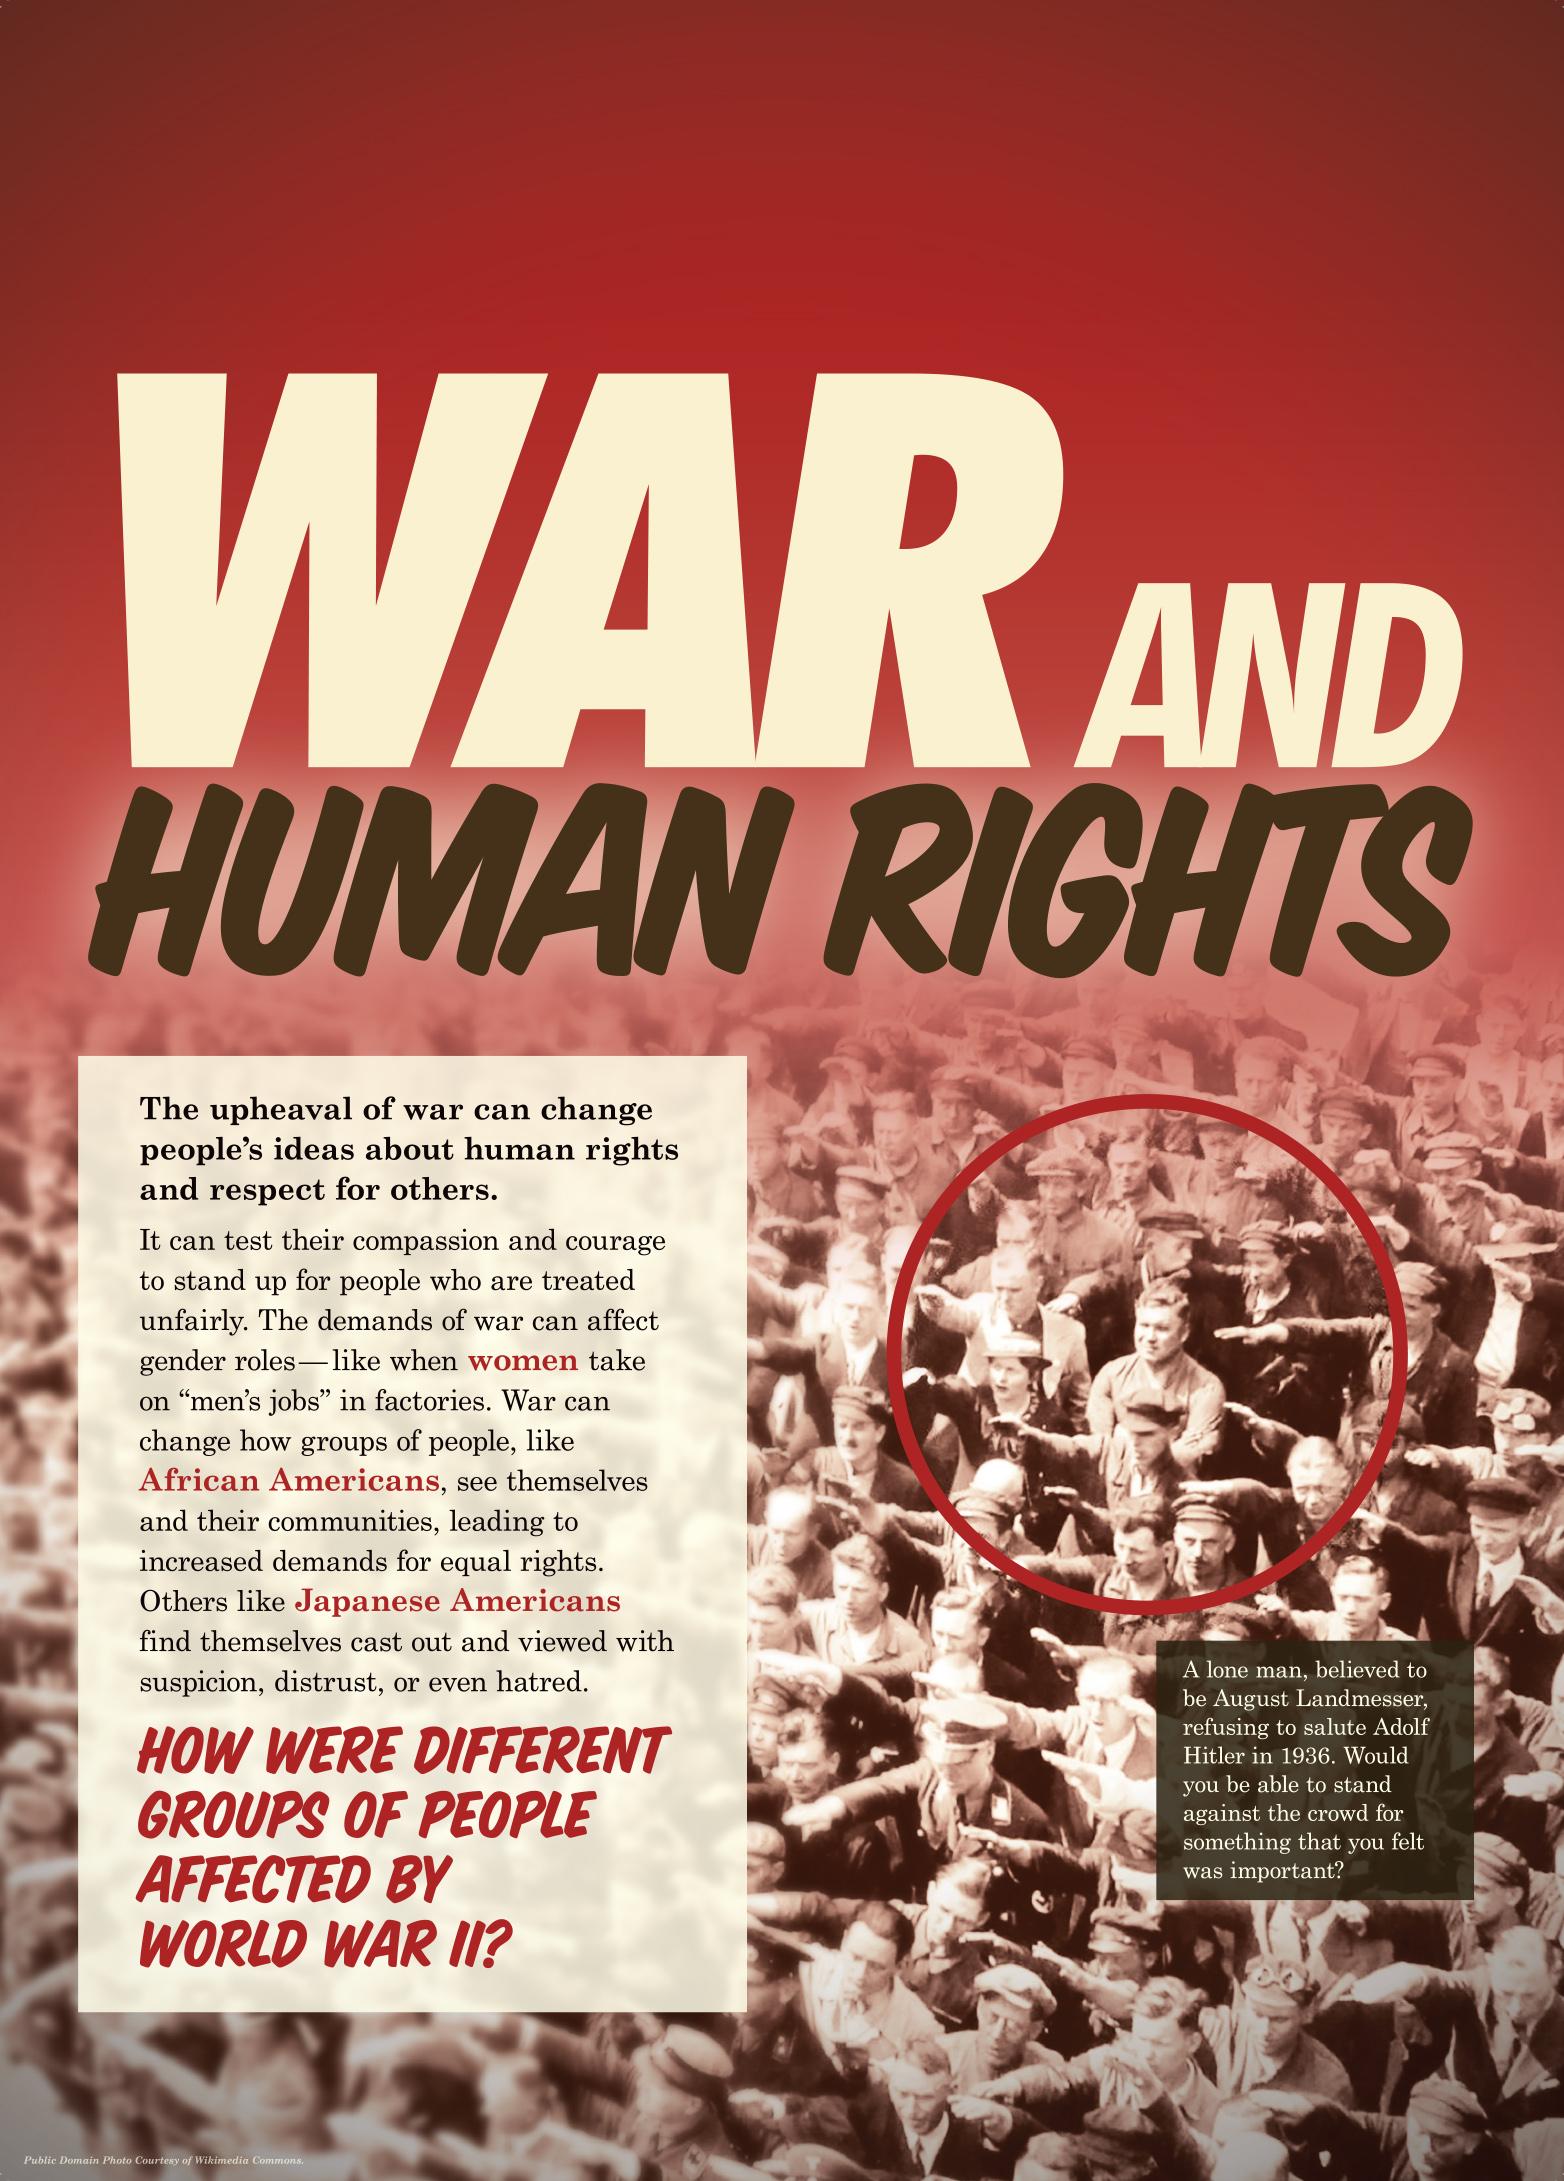 WWII-exhibit_10-OP-001_HumanRights.jpg